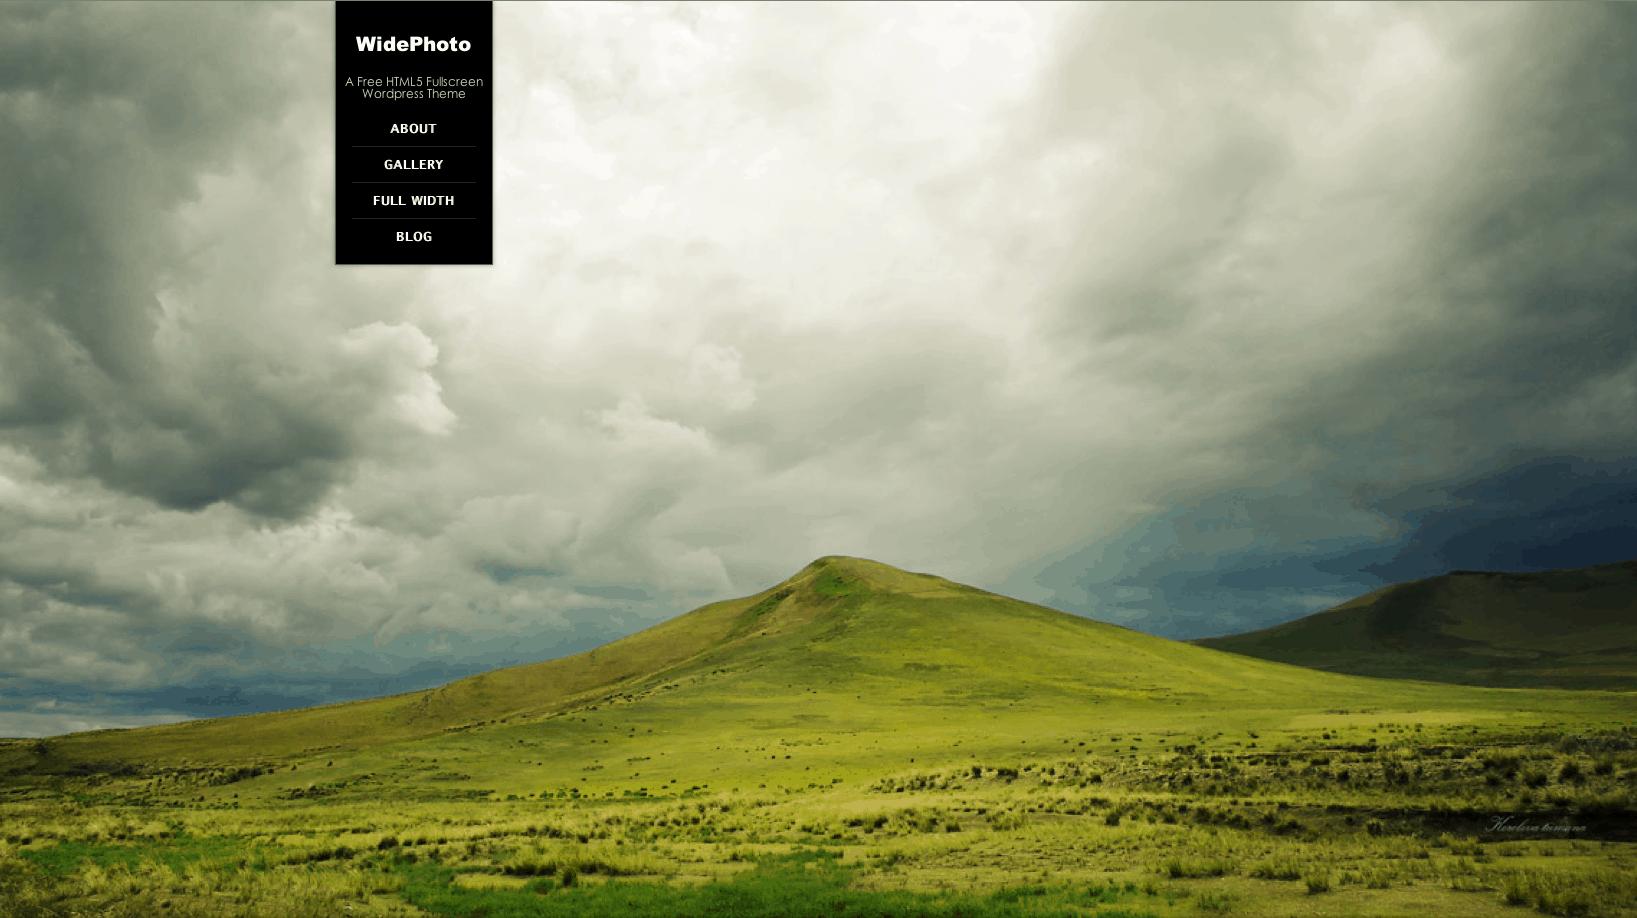 Best free wordpress themes widephotos